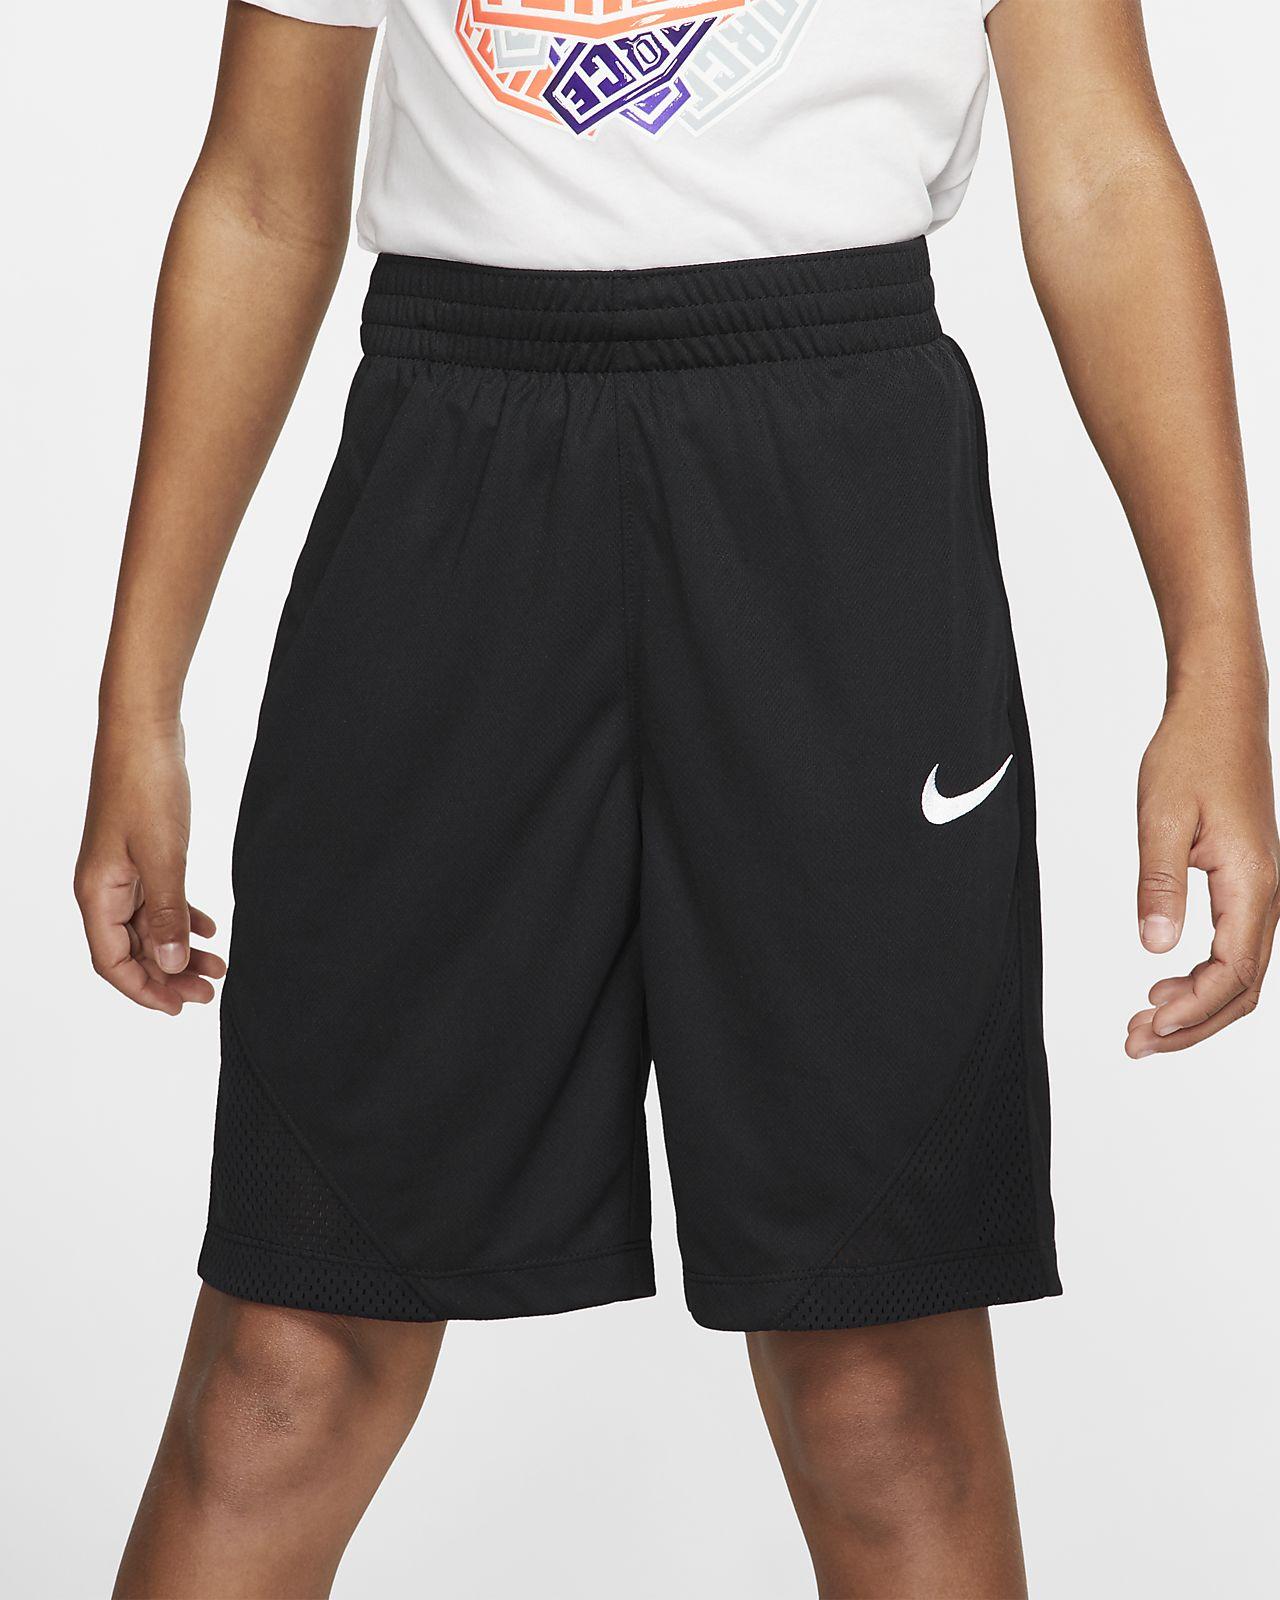 Nike Dry Boys' Basketball Shorts